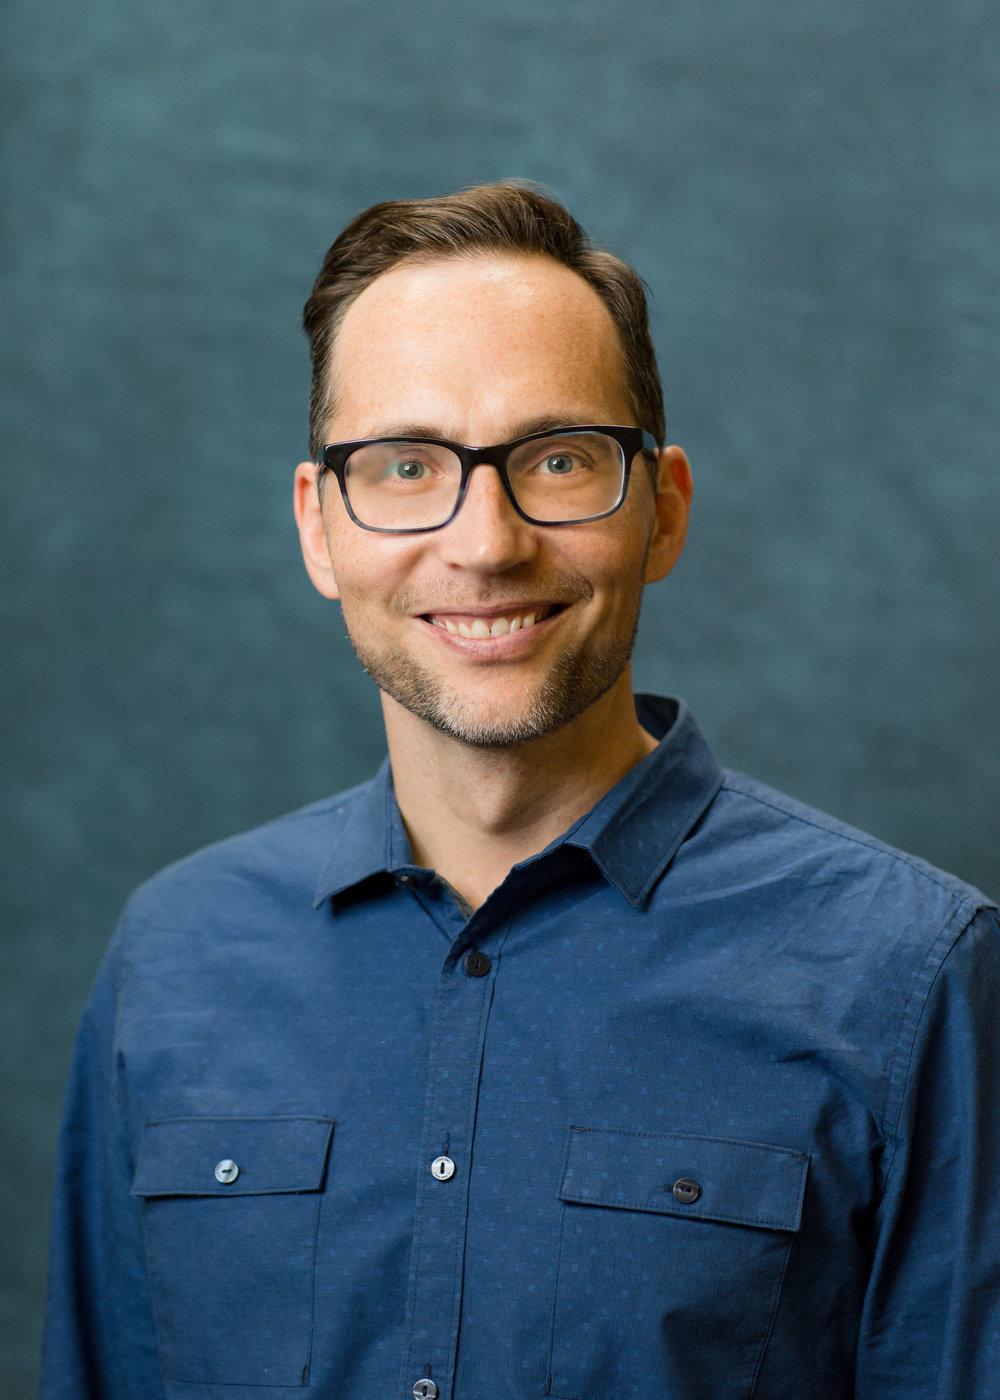 Zachary Stahl, MA, LMFT - EDUCATIONMaster's Degree:John F. Kennedy UniversityBachelor's Degree:CSU Monterey BayLICENSURELicensed Marriage & Family TherapistPROFESSIONAL MEMBERSHIPSCAMFTCLINICOakland